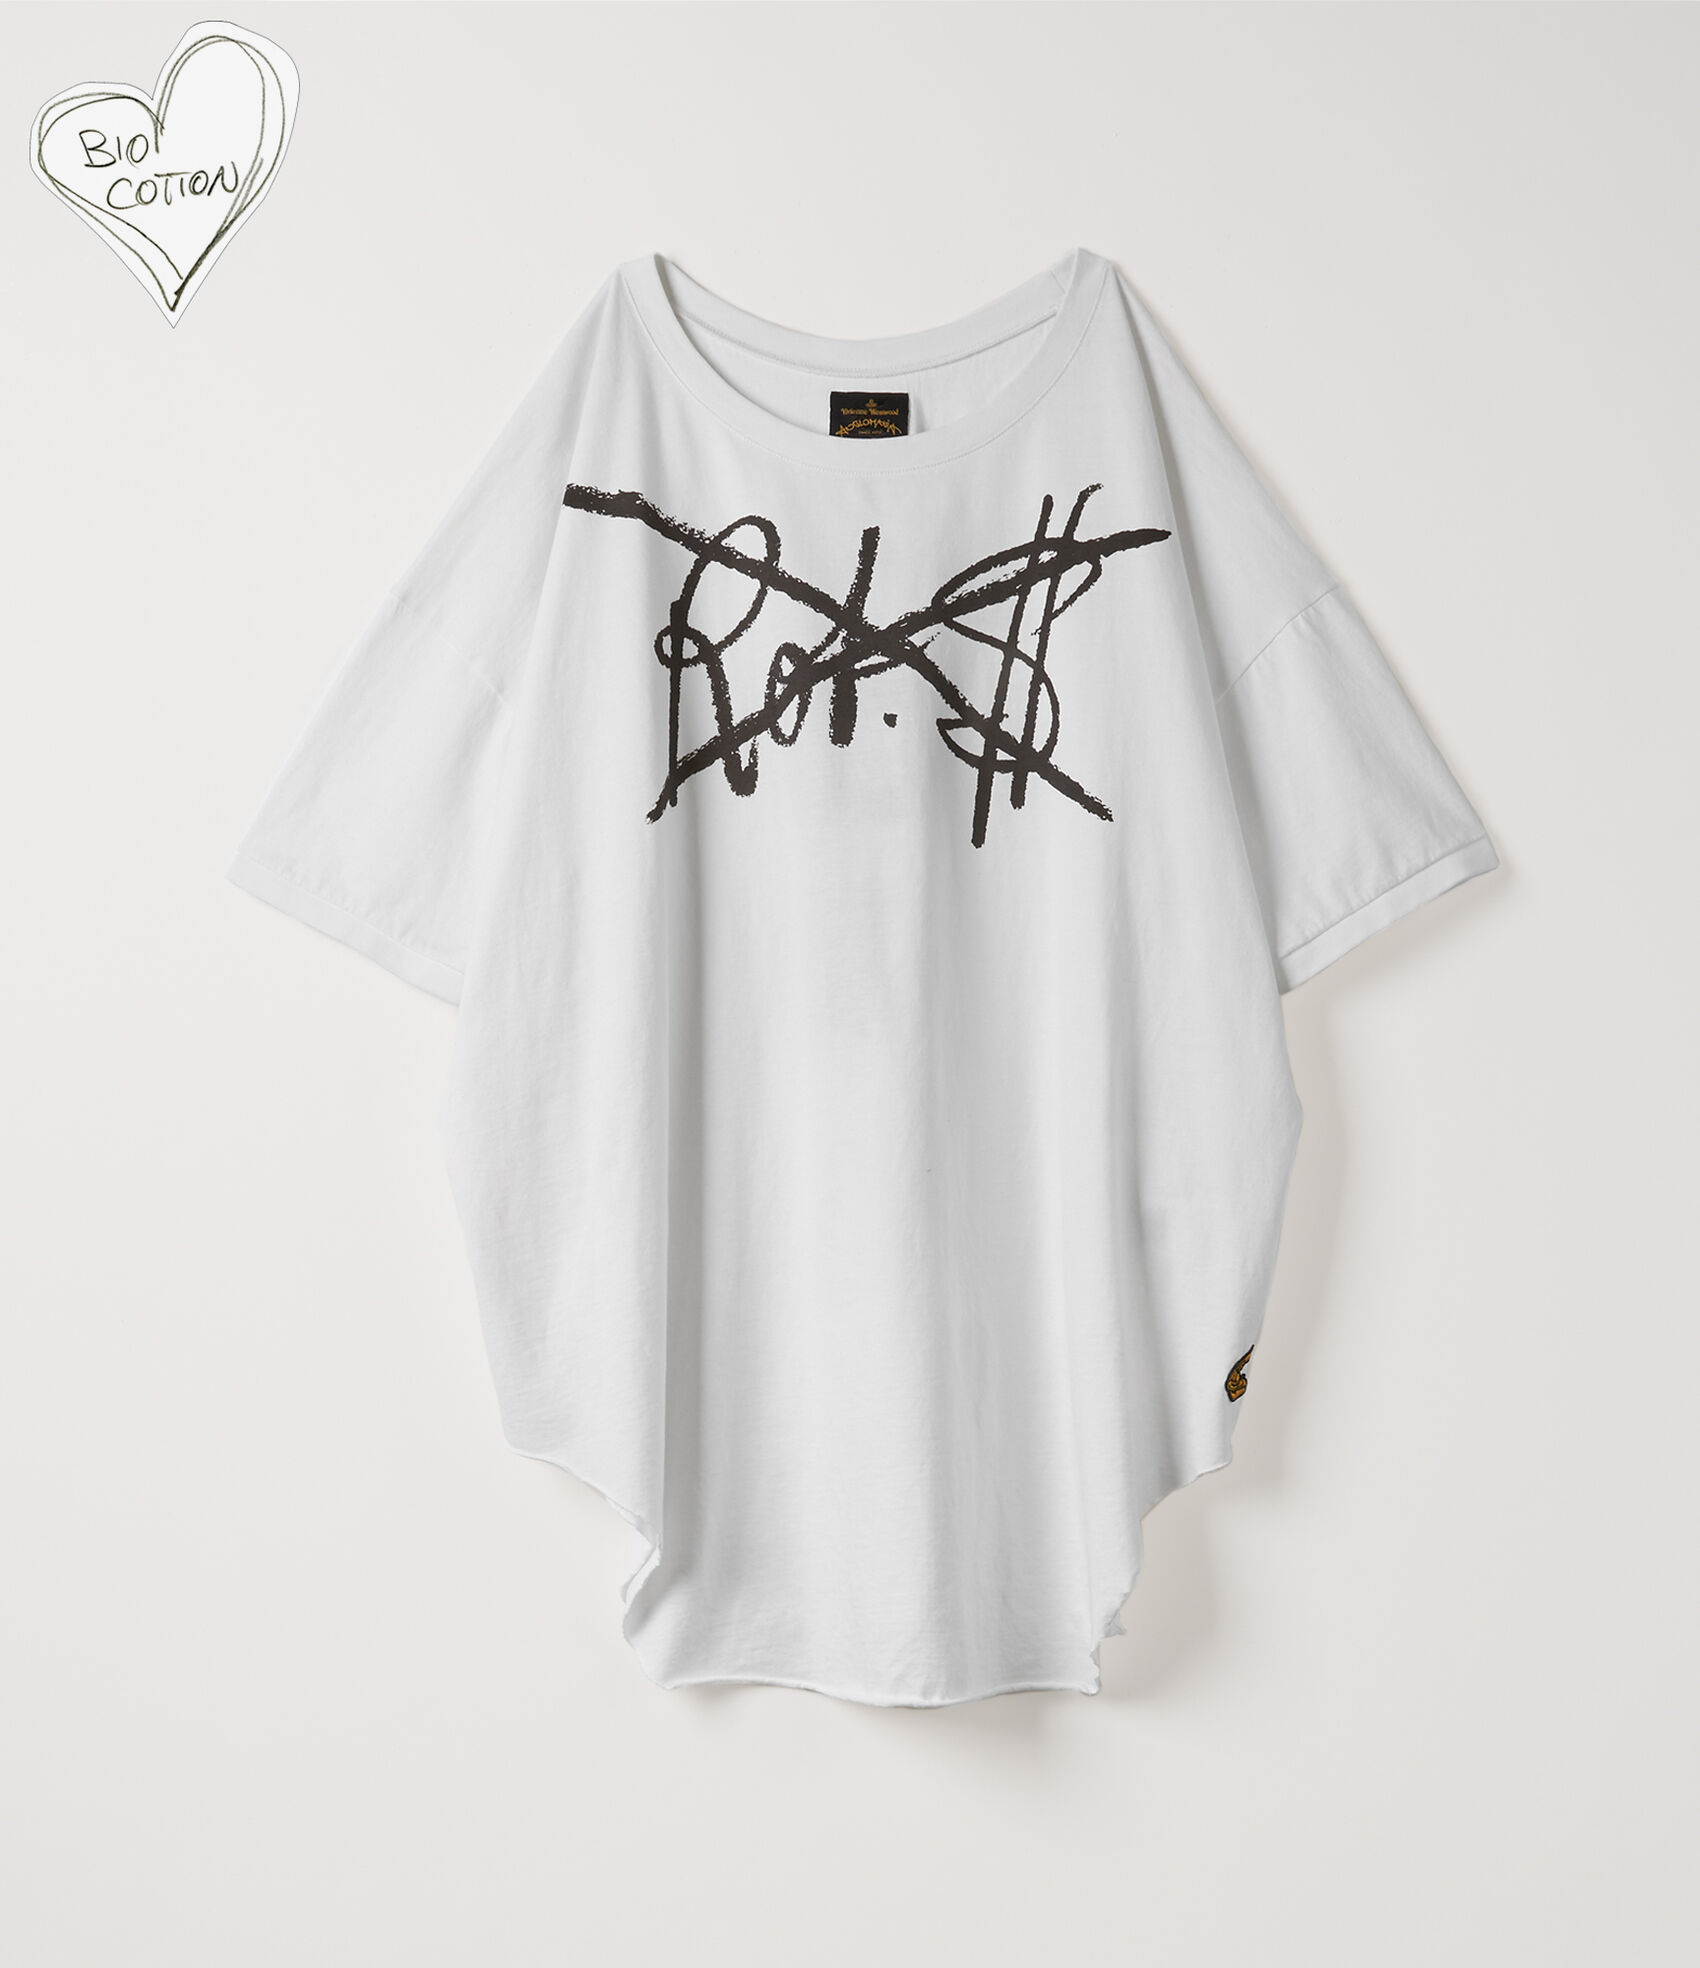 6159456e Baggy T-Shirt White | Women's T-shirts | Vivienne Westwood